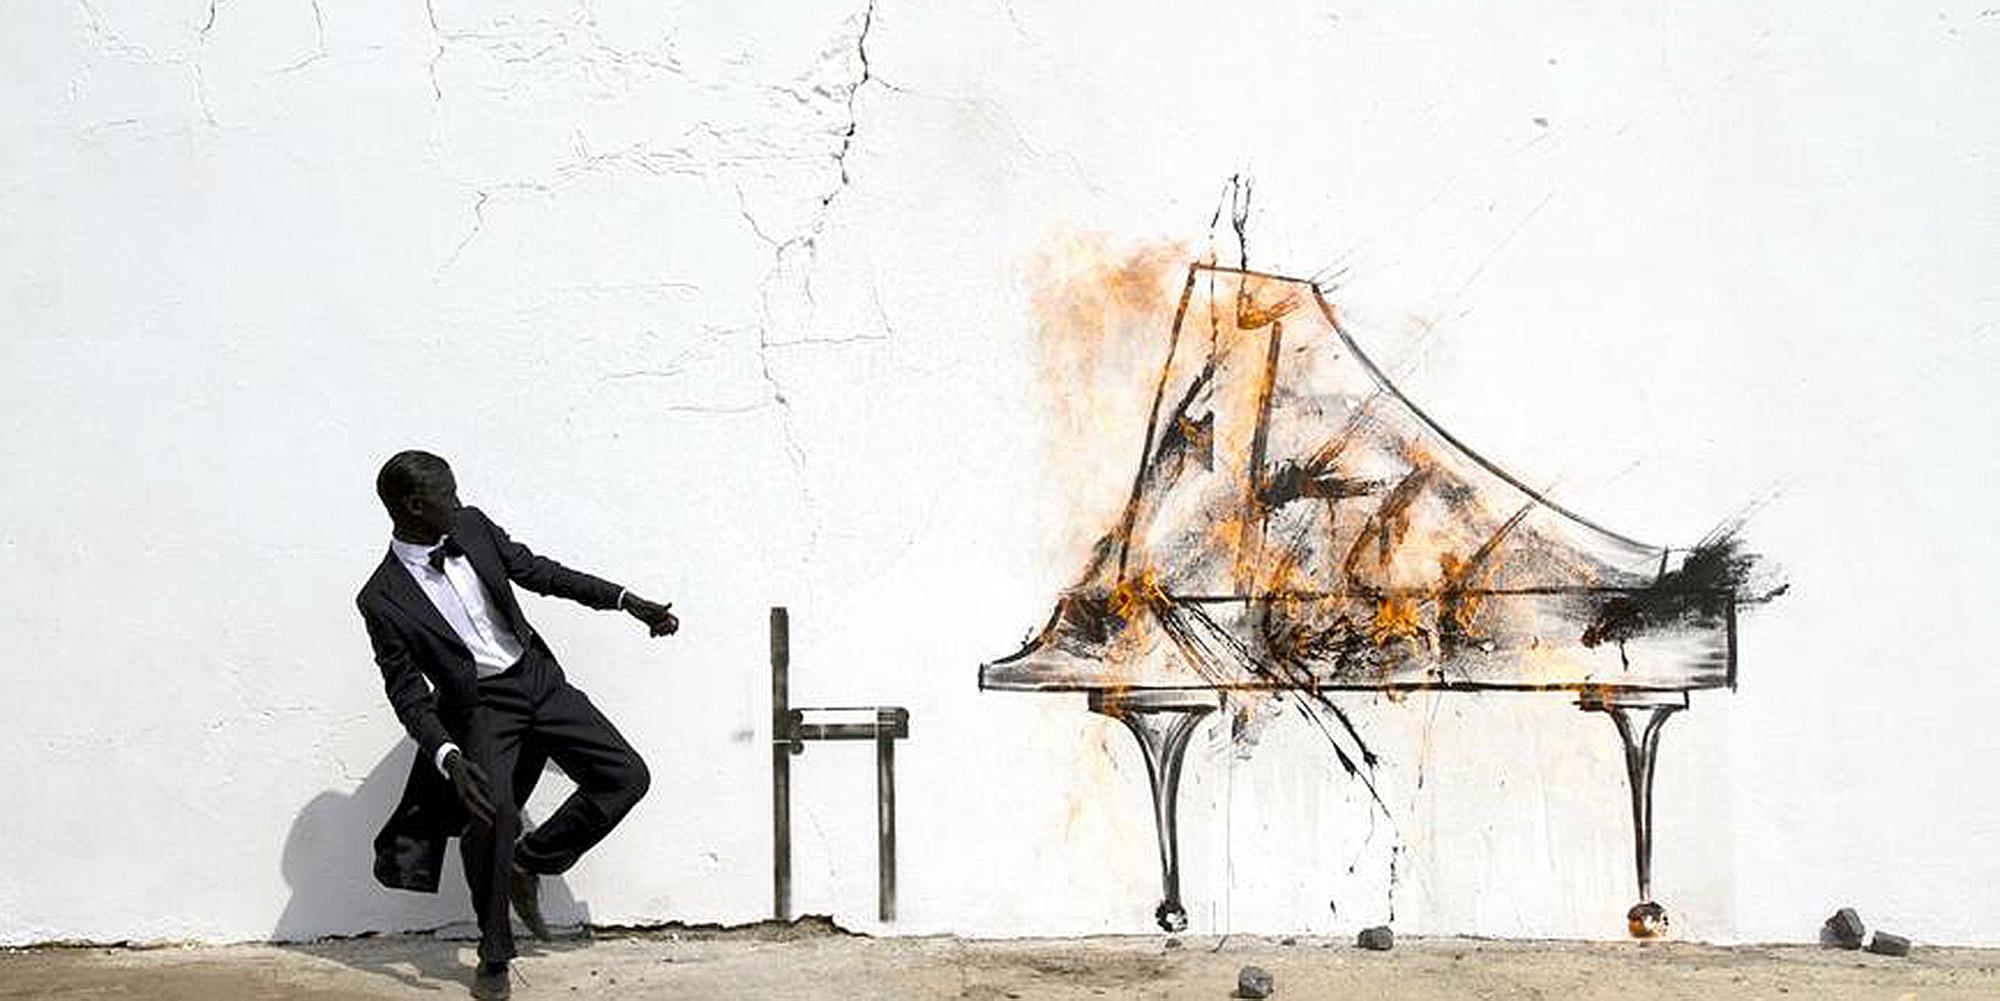 © Courtesy: The Artist; Robin Rhode, Piano Chair, 2011